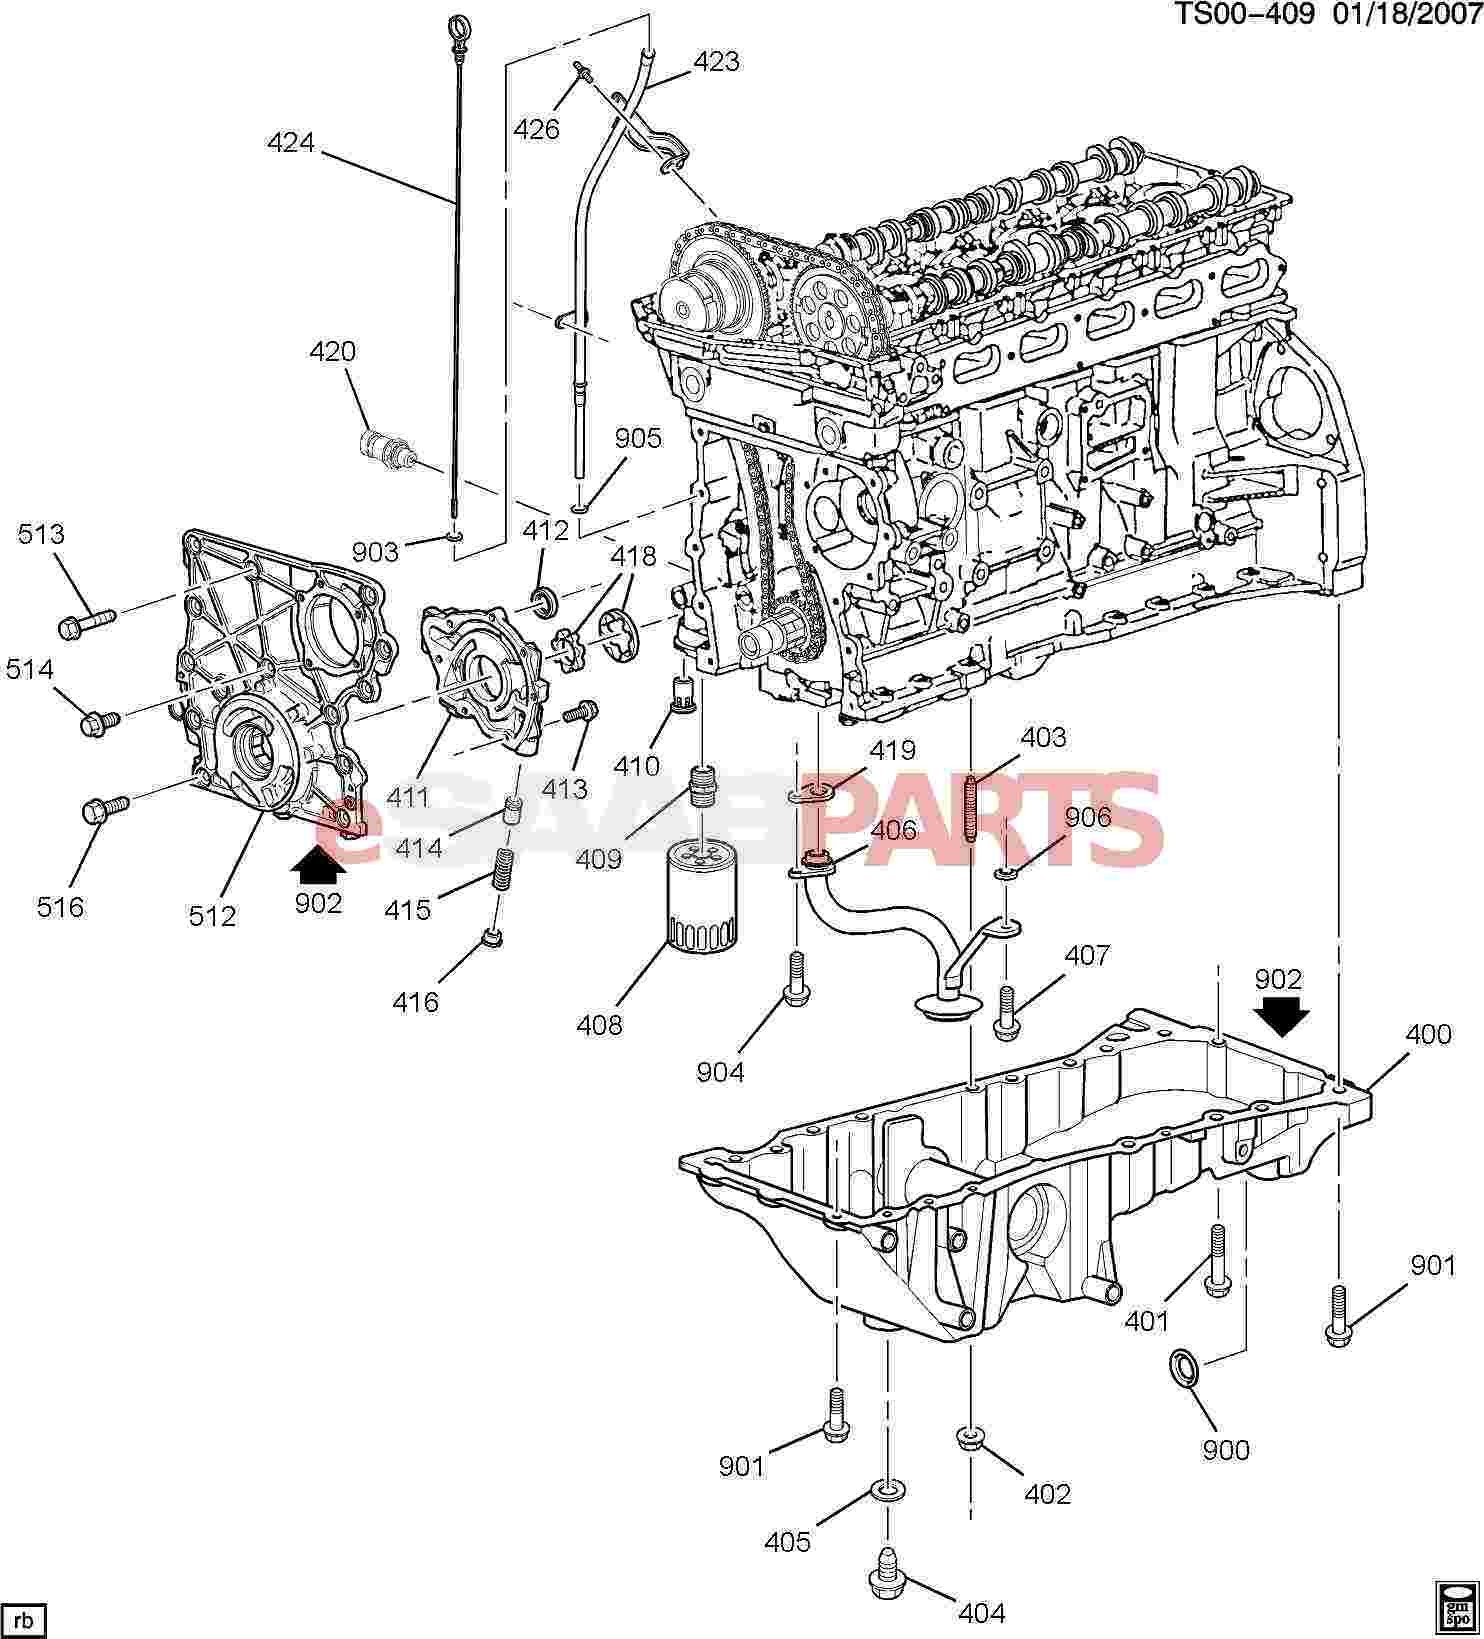 Auto Engine Parts Diagram Esaabparts Saab 9 7x Engine Parts Engine ...